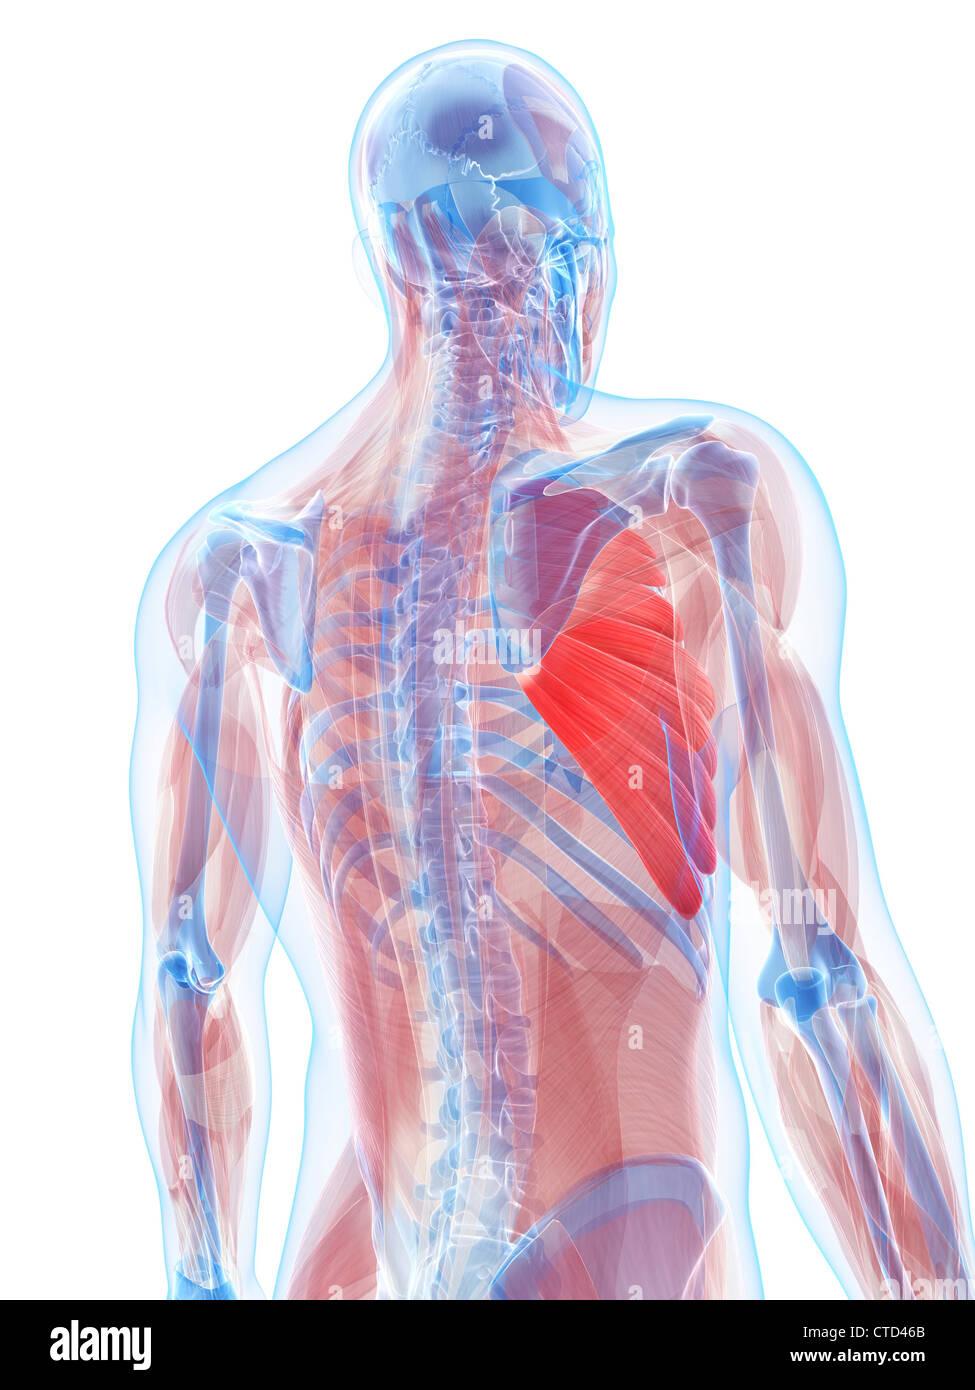 Brust-Muskeln-Kunstwerk Stockfoto, Bild: 49461171 - Alamy